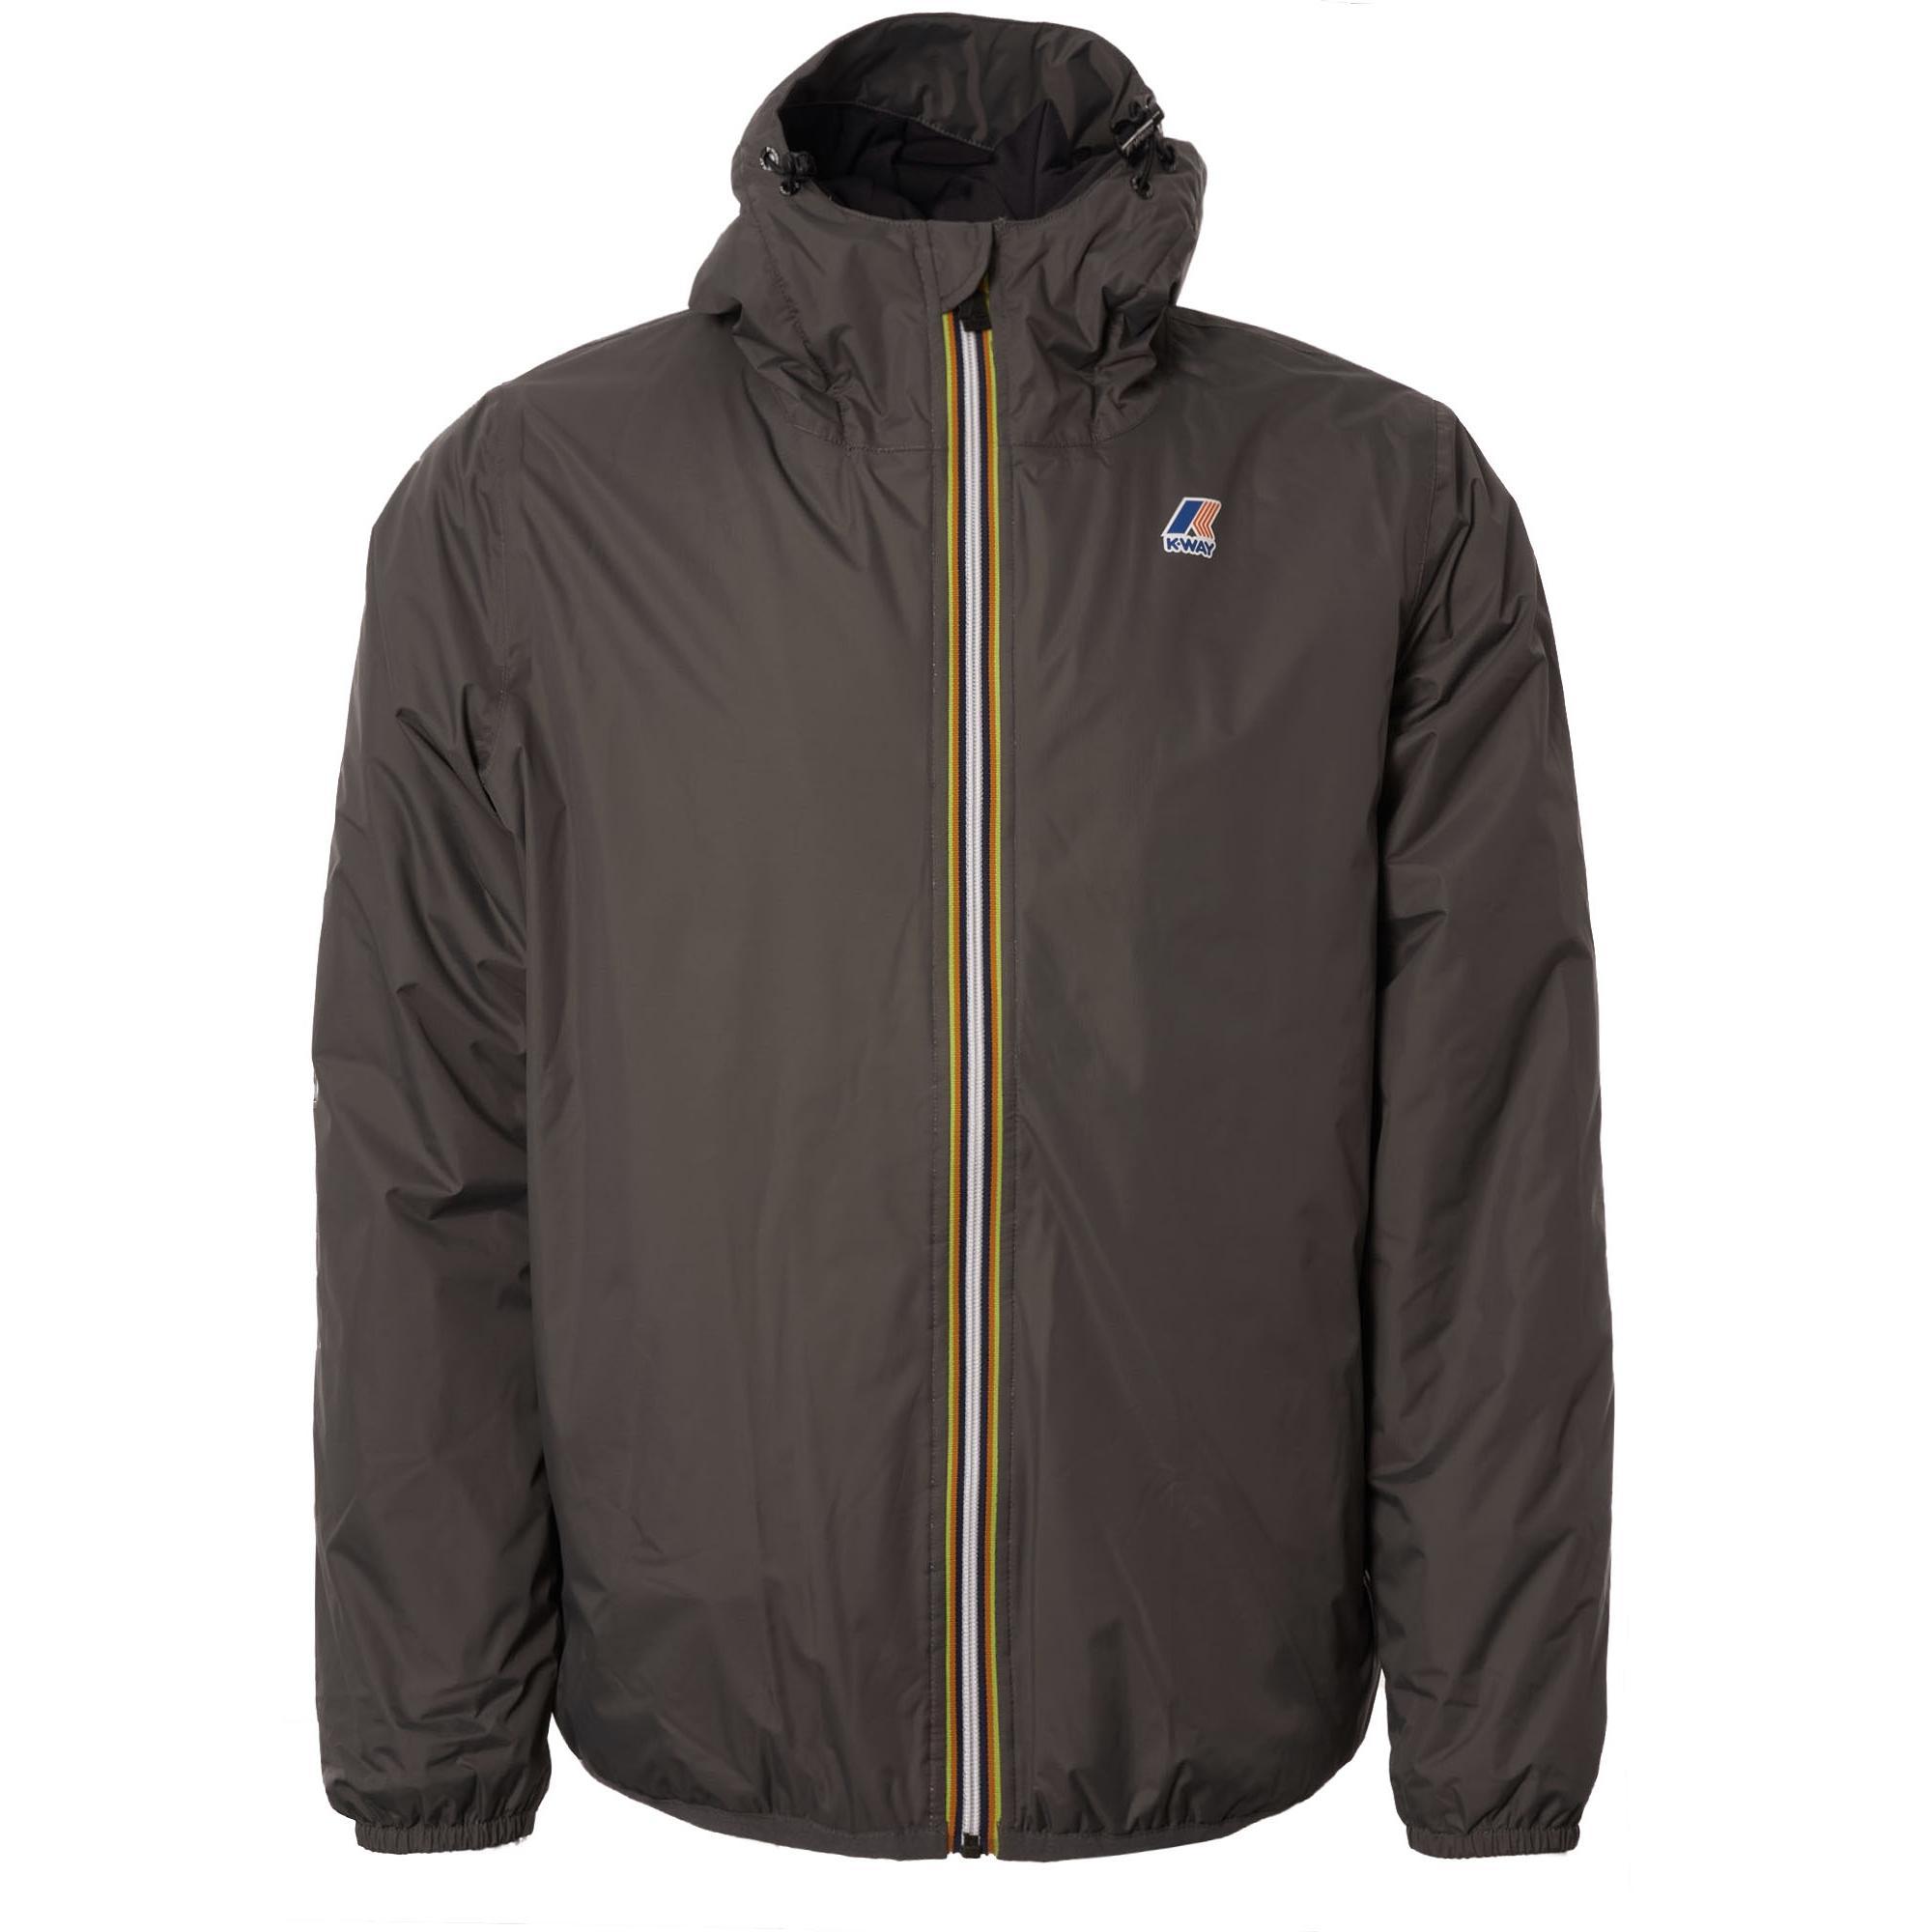 855fa65e5639 K-Way Le Vrai 3.0 Claude Padded Jacket - Grey Smoke in Gray for Men ...